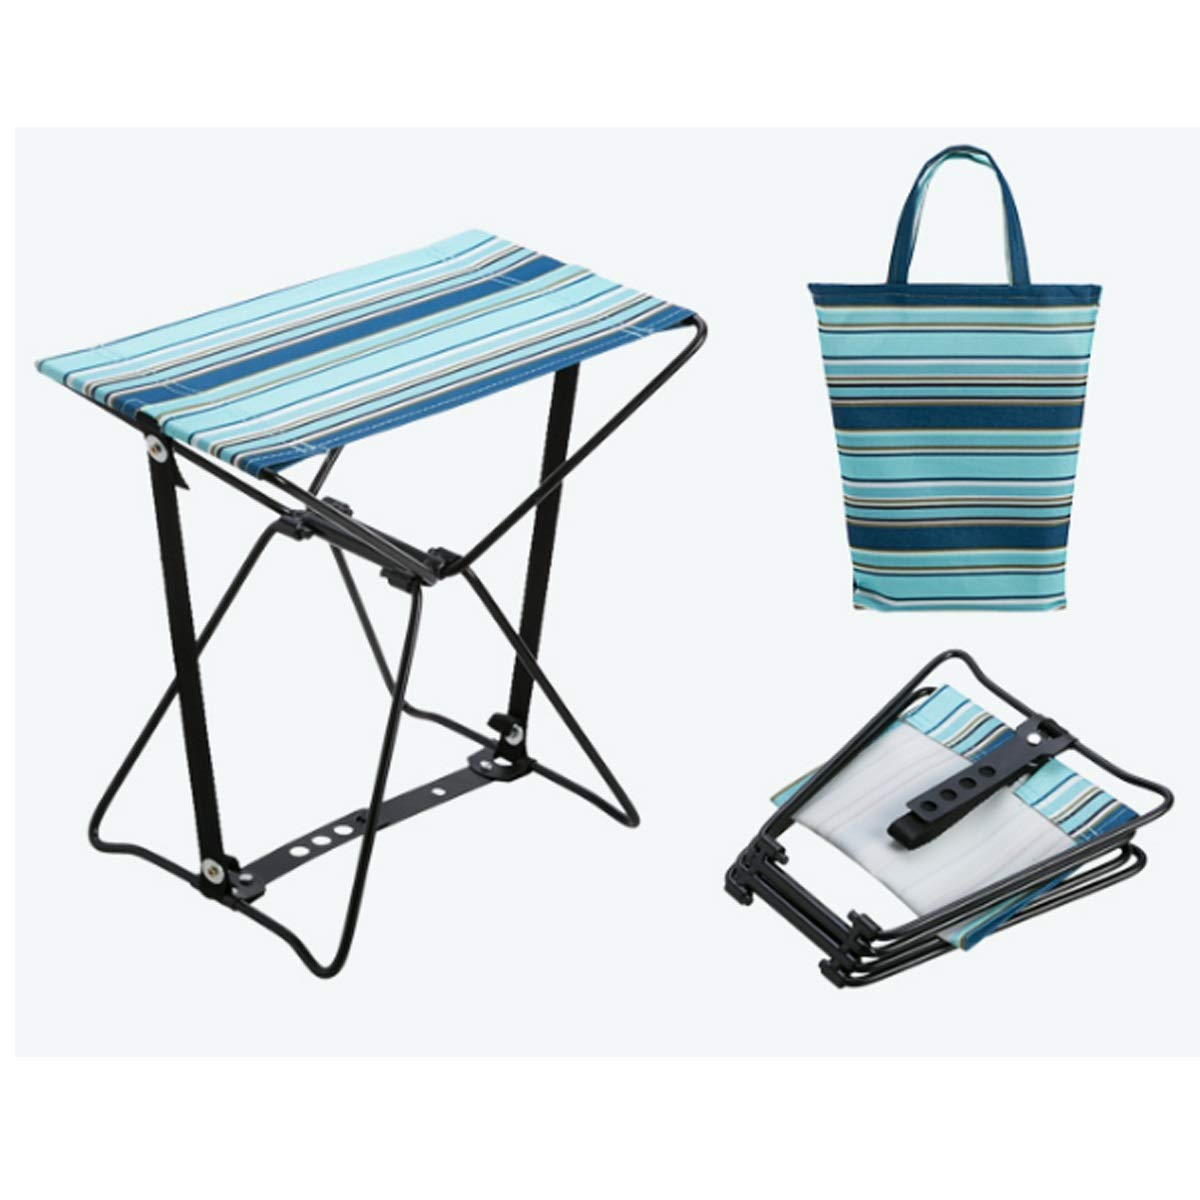 Tongboshi Portable, Small Stool, Small Chair, Outdoor Travel, Fishing Stool, Ride, Folding, Mini Stool, Folding Chair Latest Models